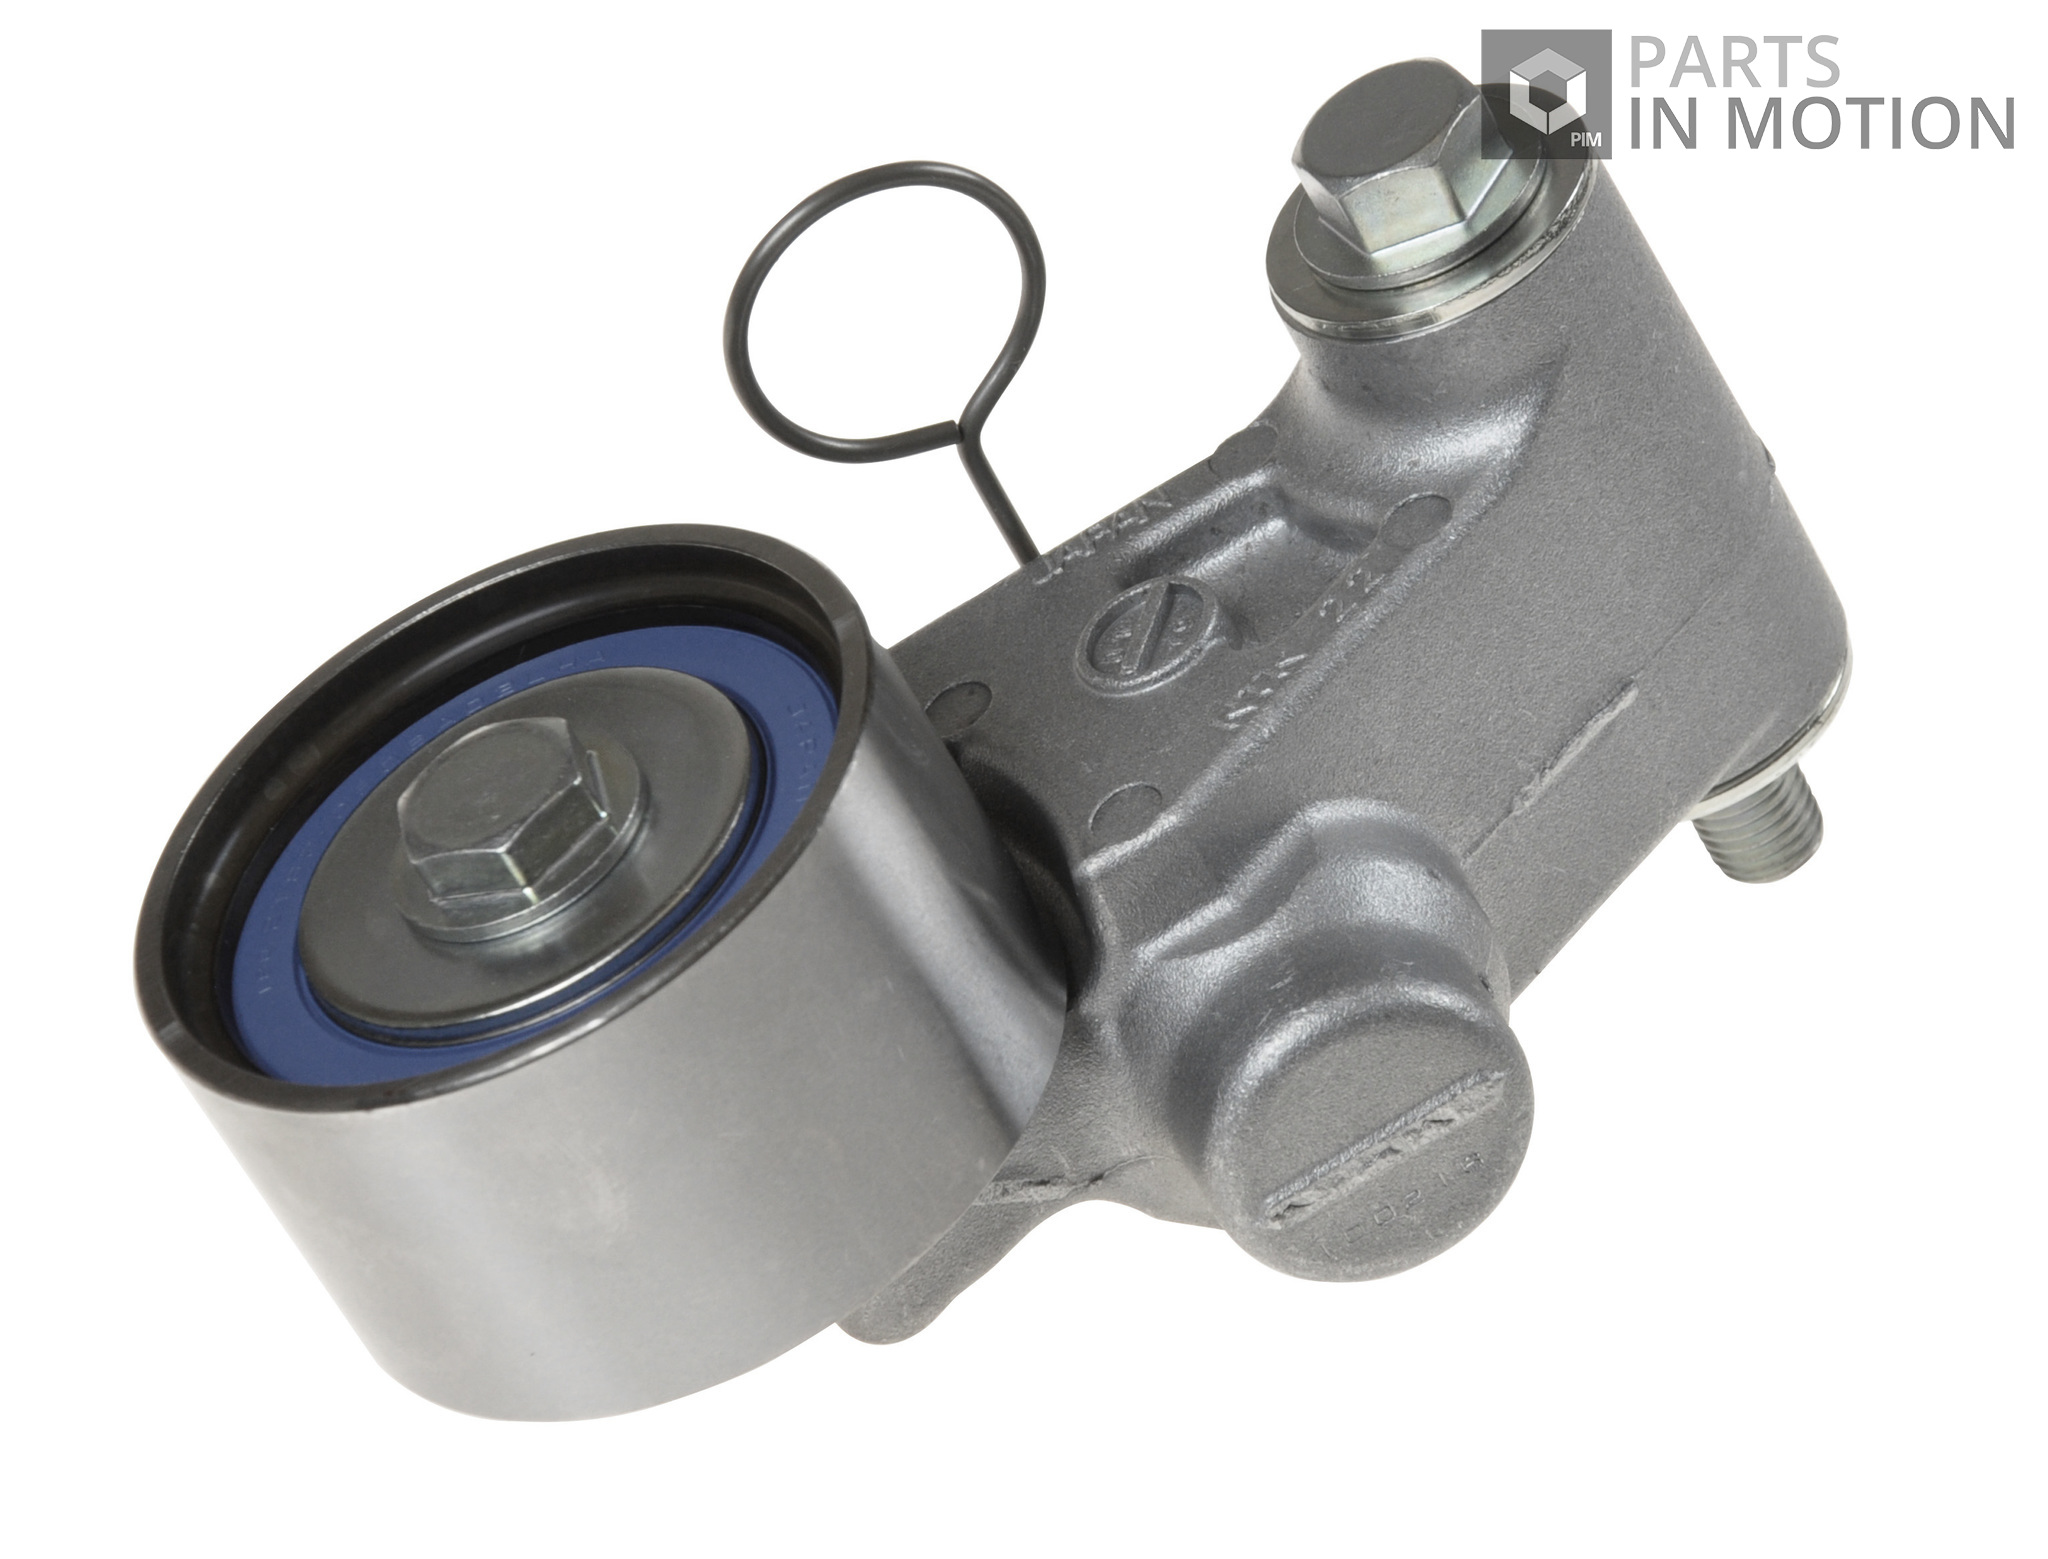 Timing Belt Tensioner Fits Subaru Legacy Mk3 20 98 To 03 Adl B4 Diagram Image Is Loading 2